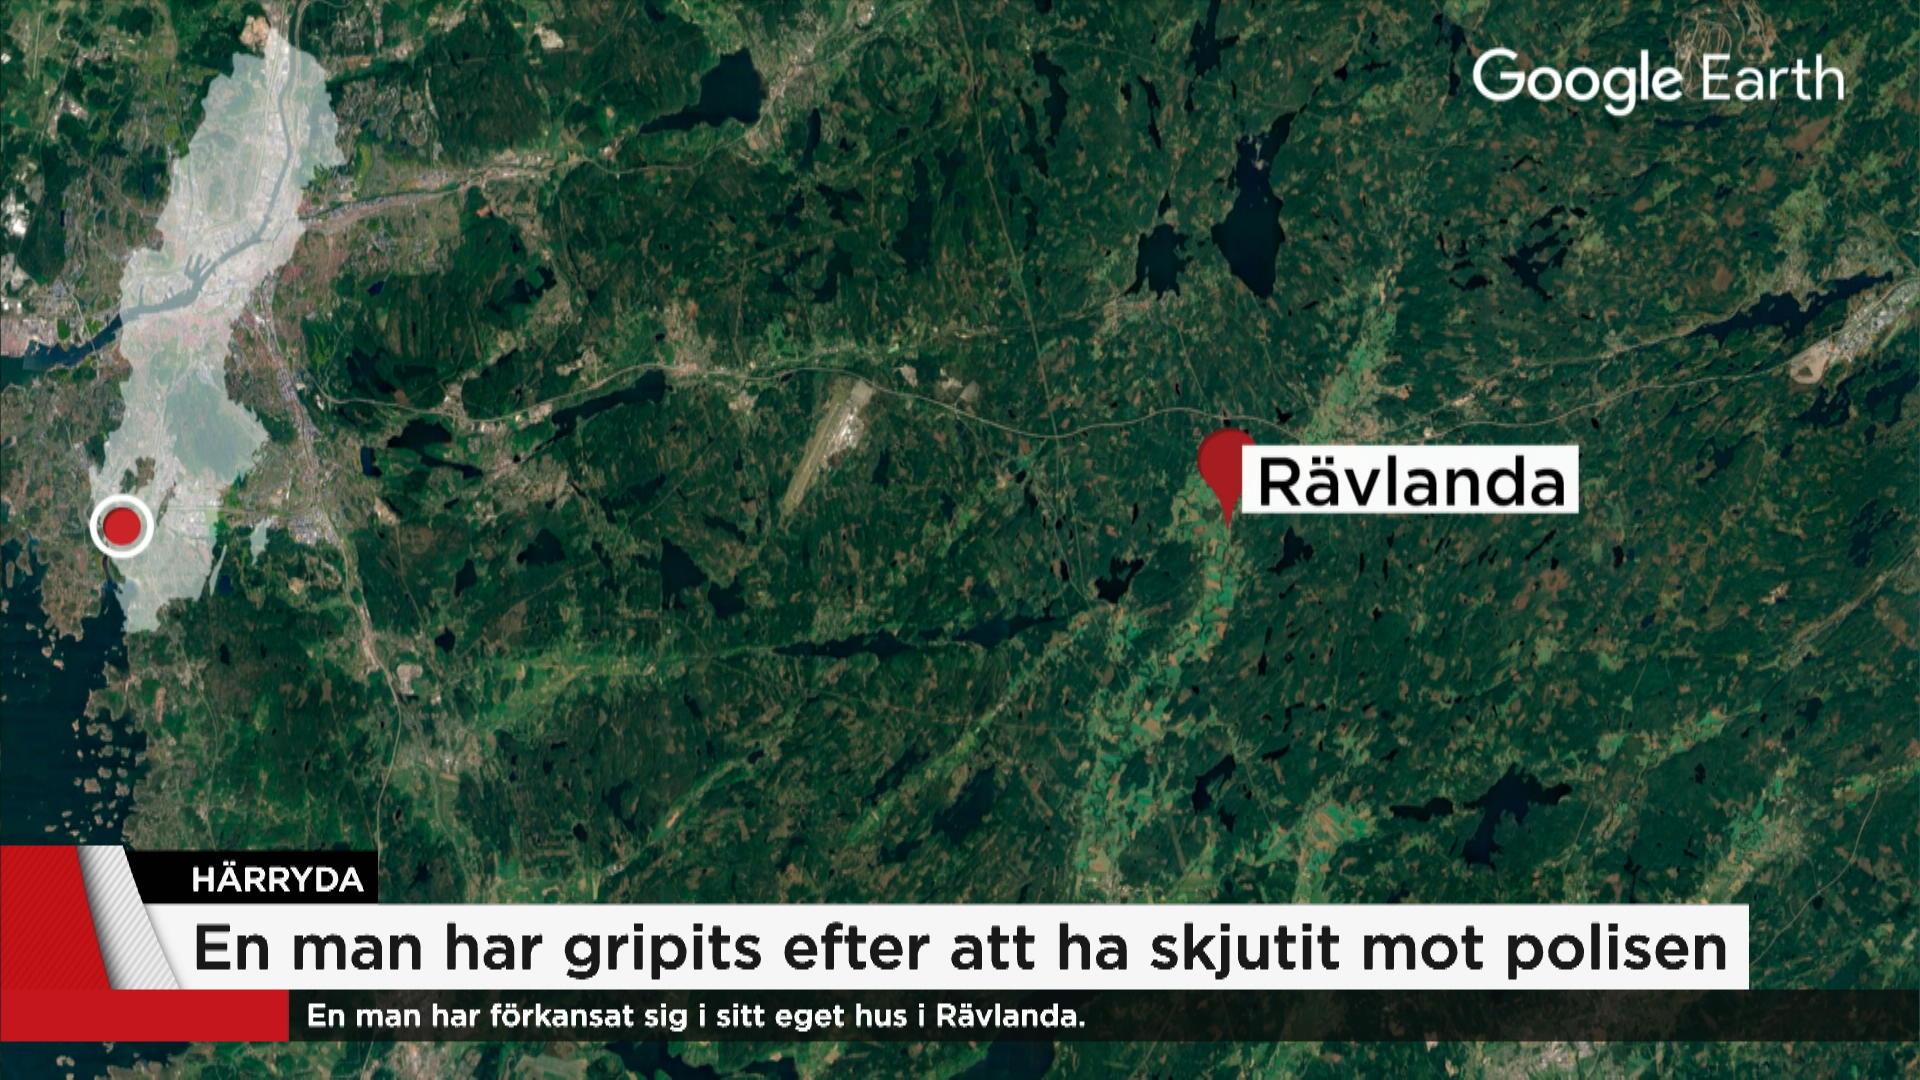 Dejt Rävlanda - Östergötland träffa tjejer, Saxtorpsskogen dating site